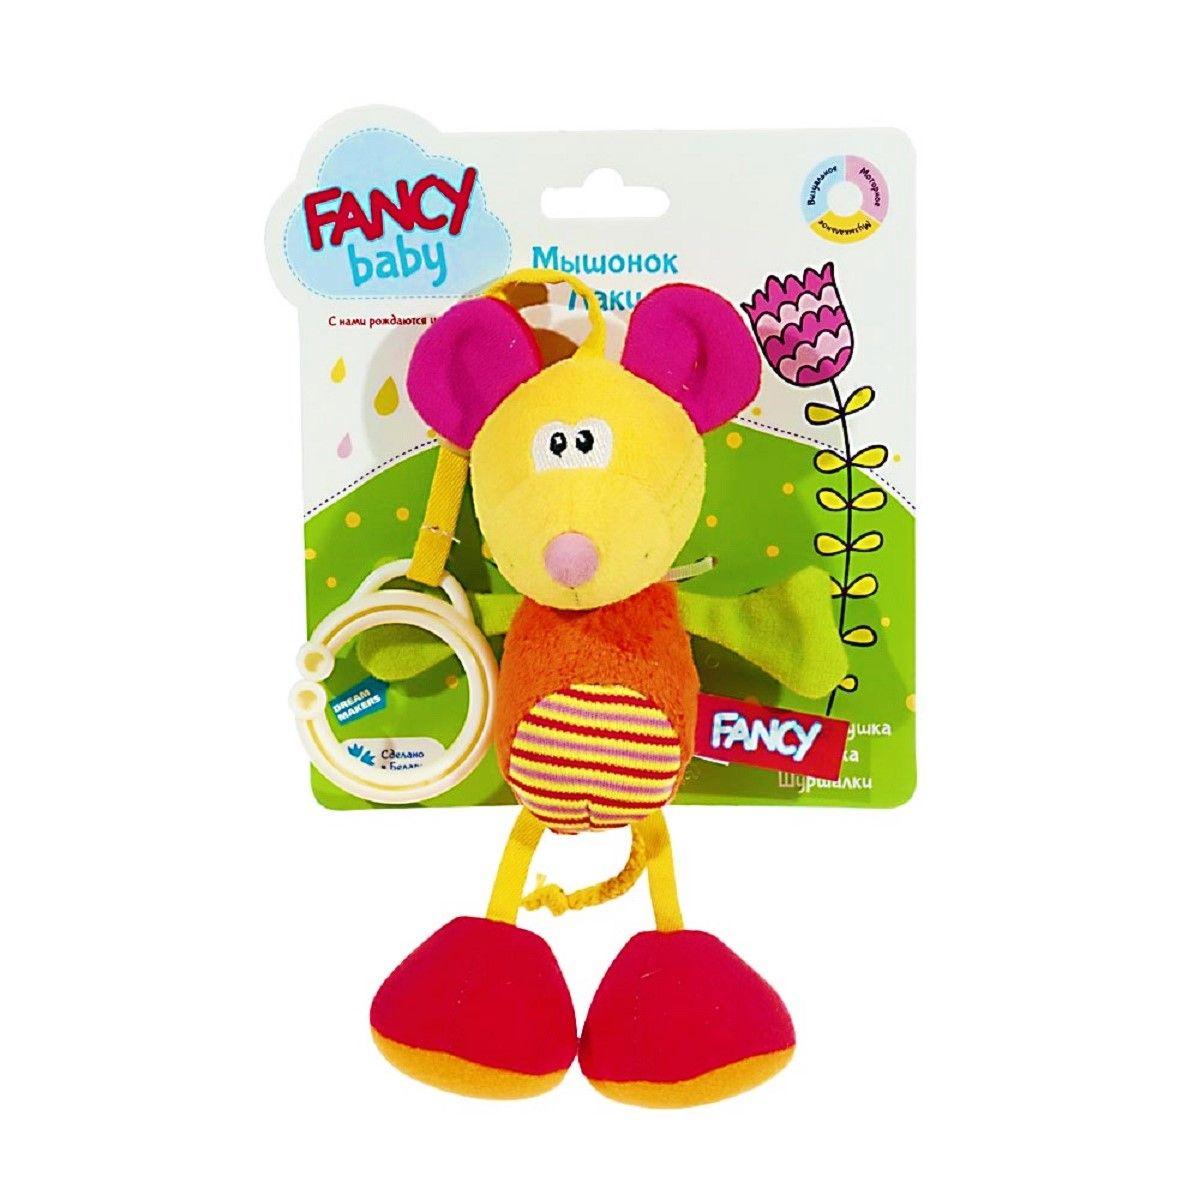 Fancy Развивающая игрушка Мышонок Лаки, Dream Makers